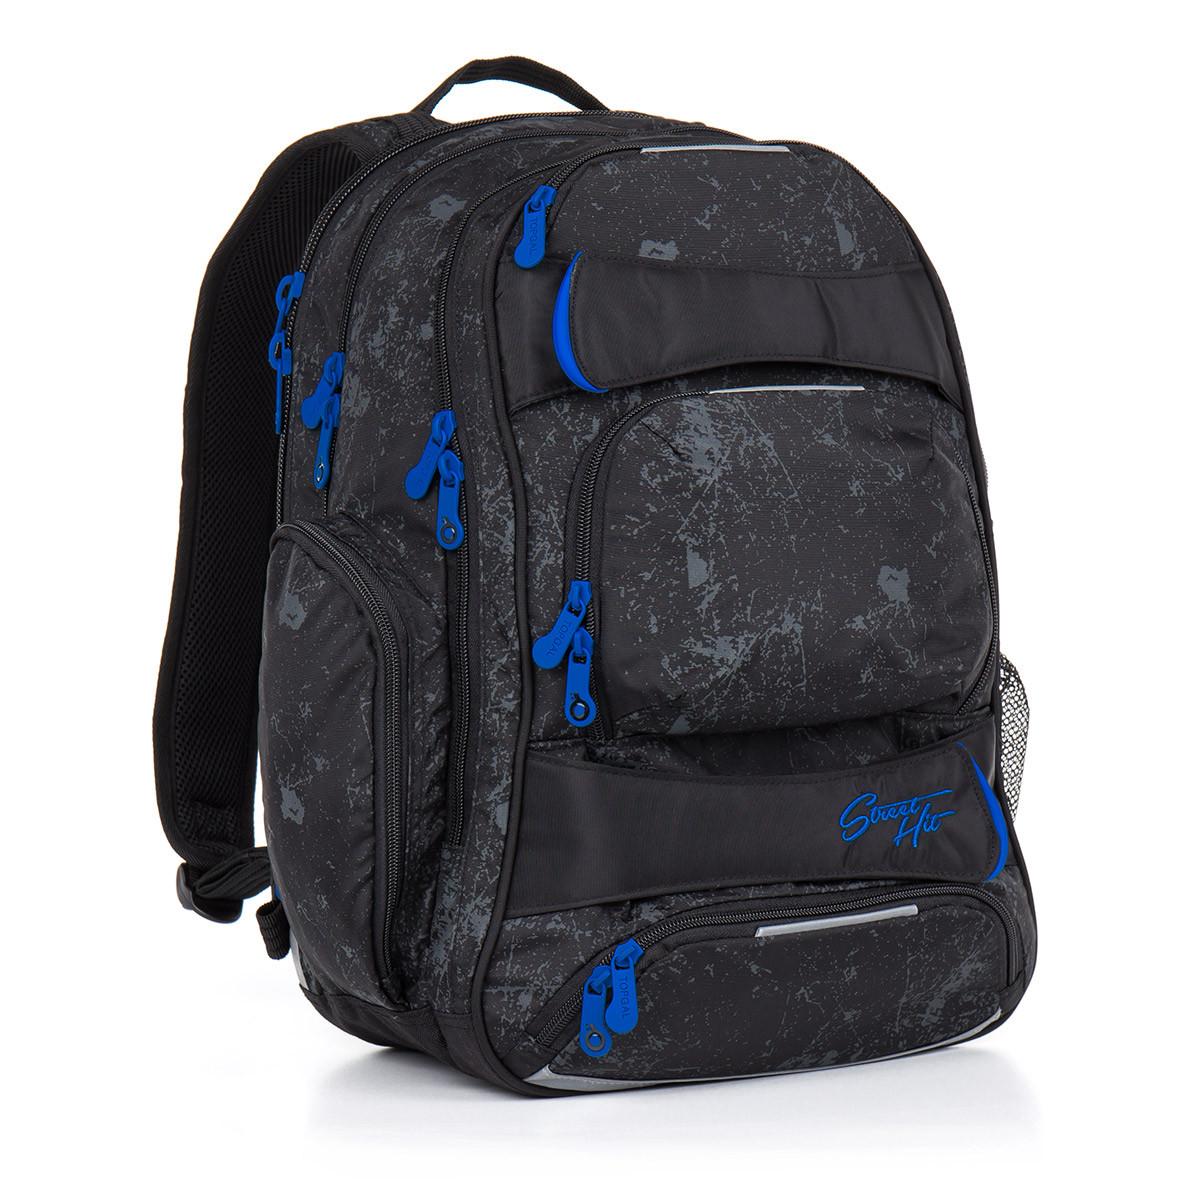 2efa757972 Studentský batoh Topgal - HIT 882 A - Black